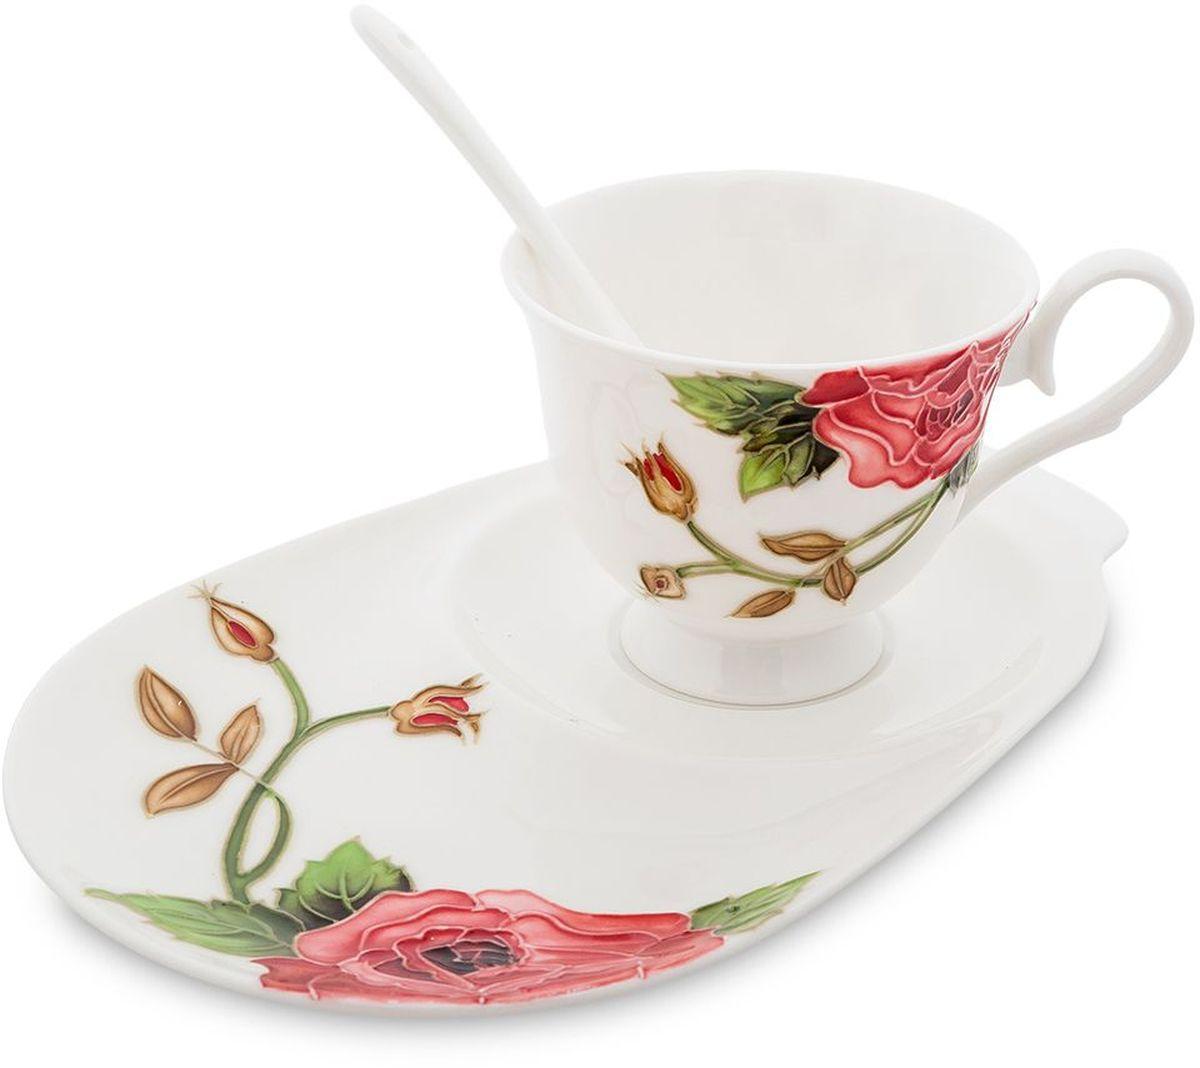 Чайная пара Pavone Рафаэлло. Роза, 3 предмета. 451582451582Объем чашки: 250 мл Длина блюдца: 23 см